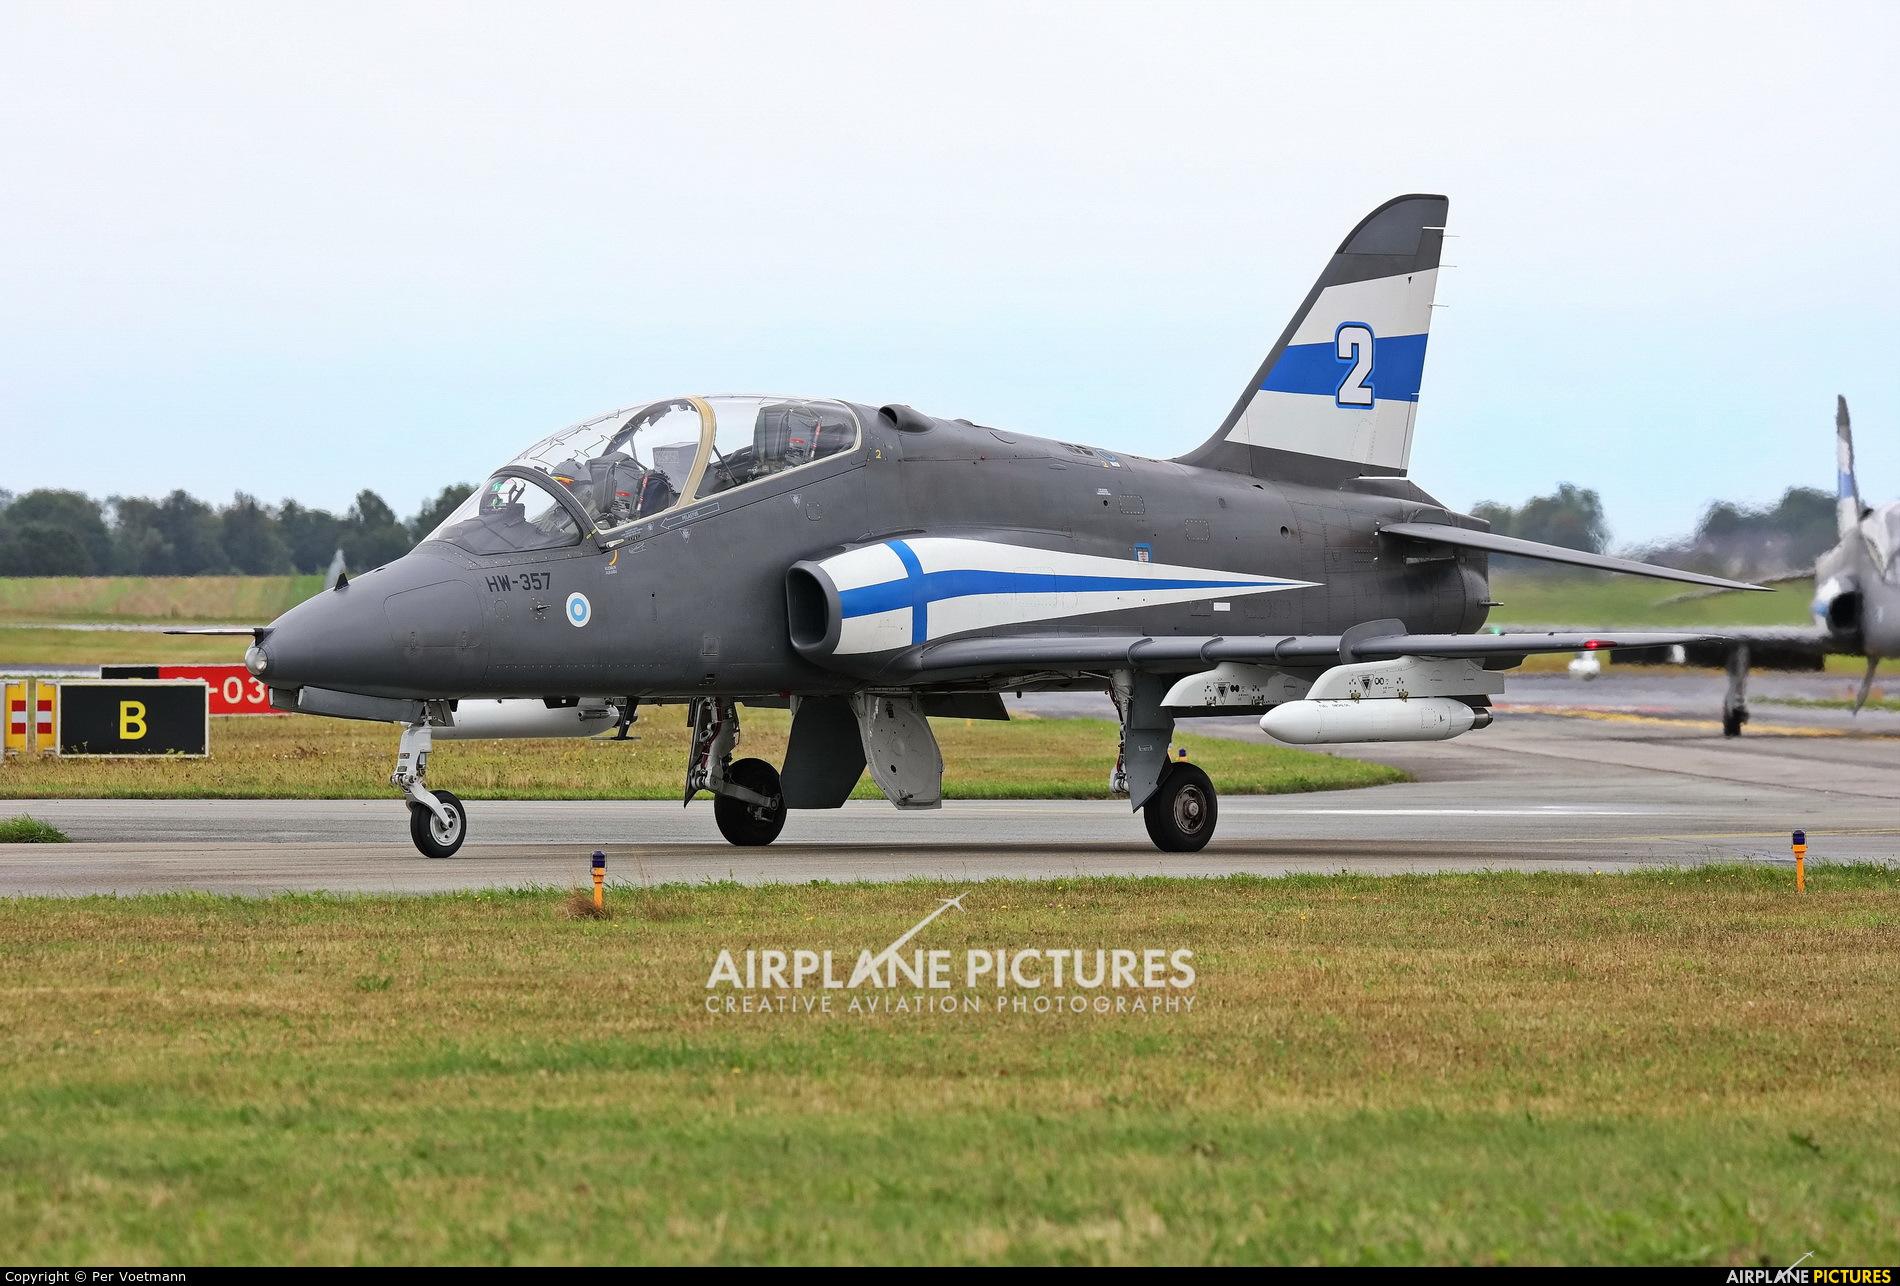 Finland - Air Force: Midnight Hawks HW-357 aircraft at Copenhagen Roskilde